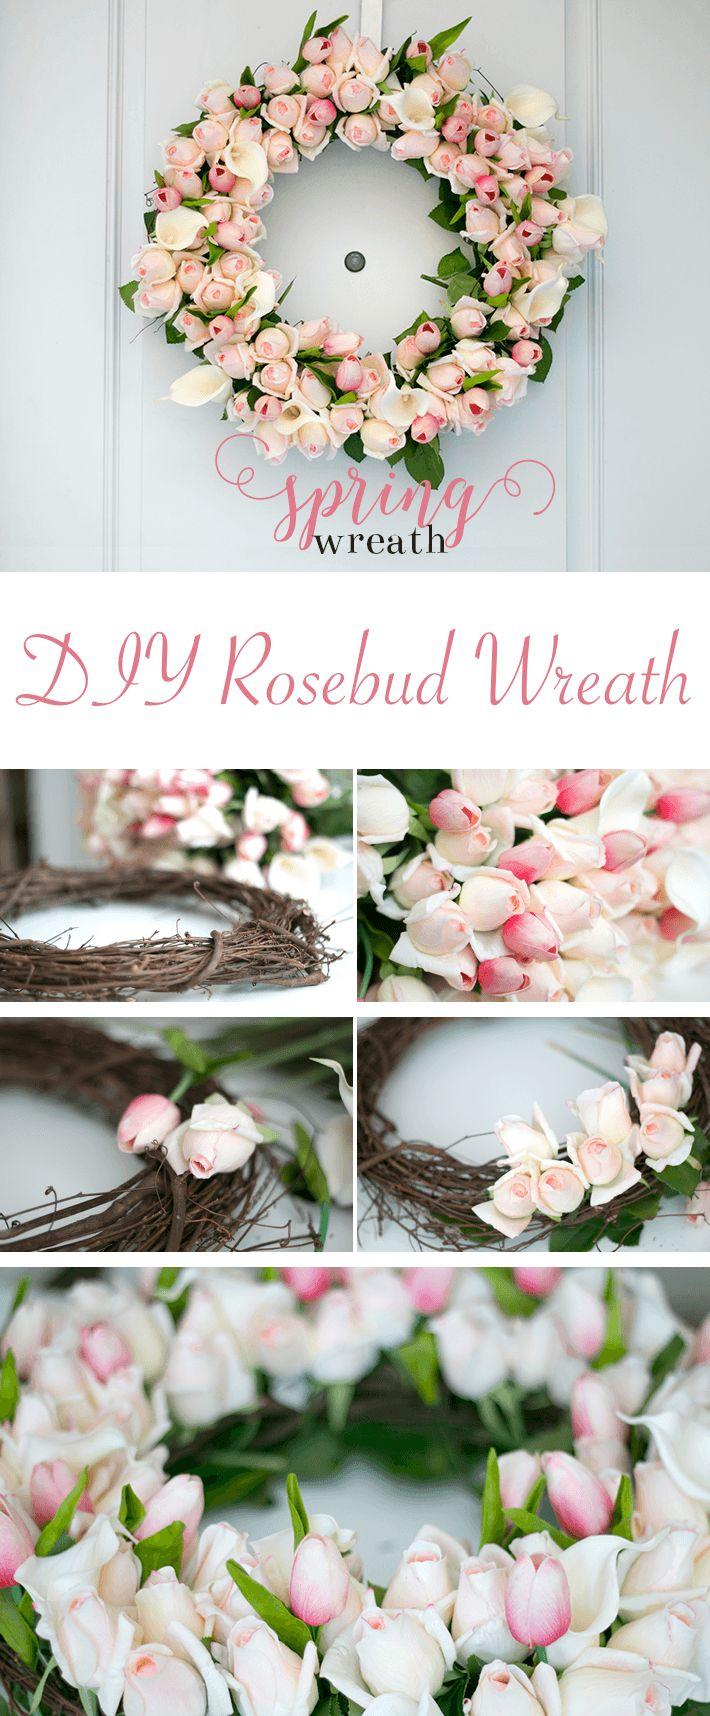 Fake flowers for crafts - 15 Creative Diy Spring Wreath Ideas To Brighten Your Door